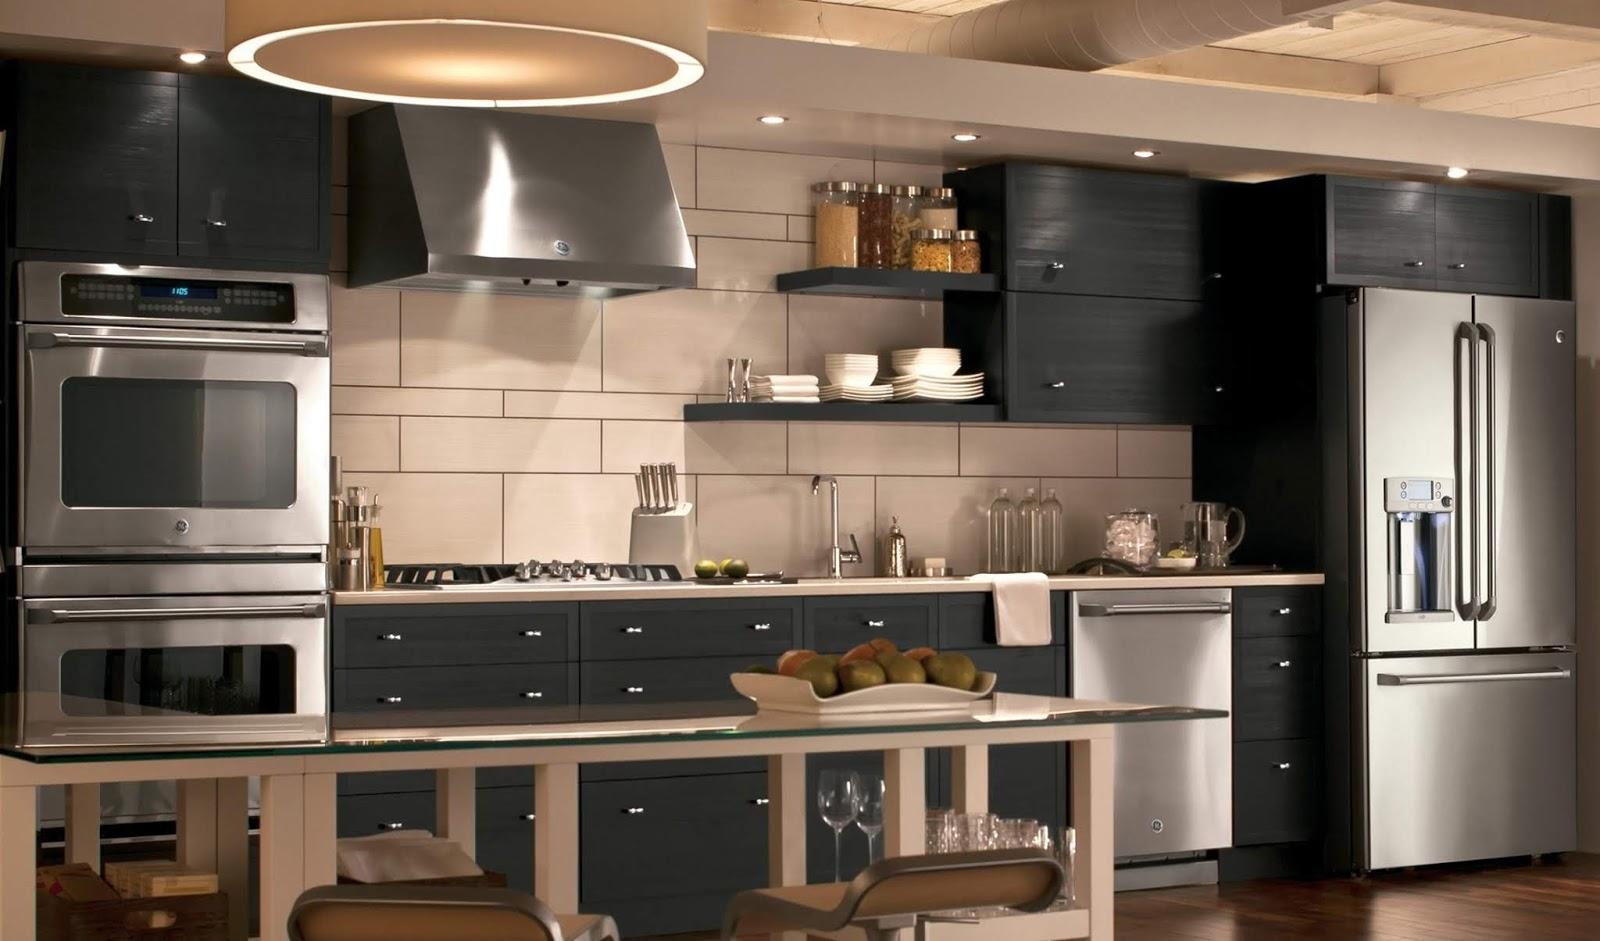 Perlengkapan dan Peralatan Dapur yang Harus Rutin Dibersihkan